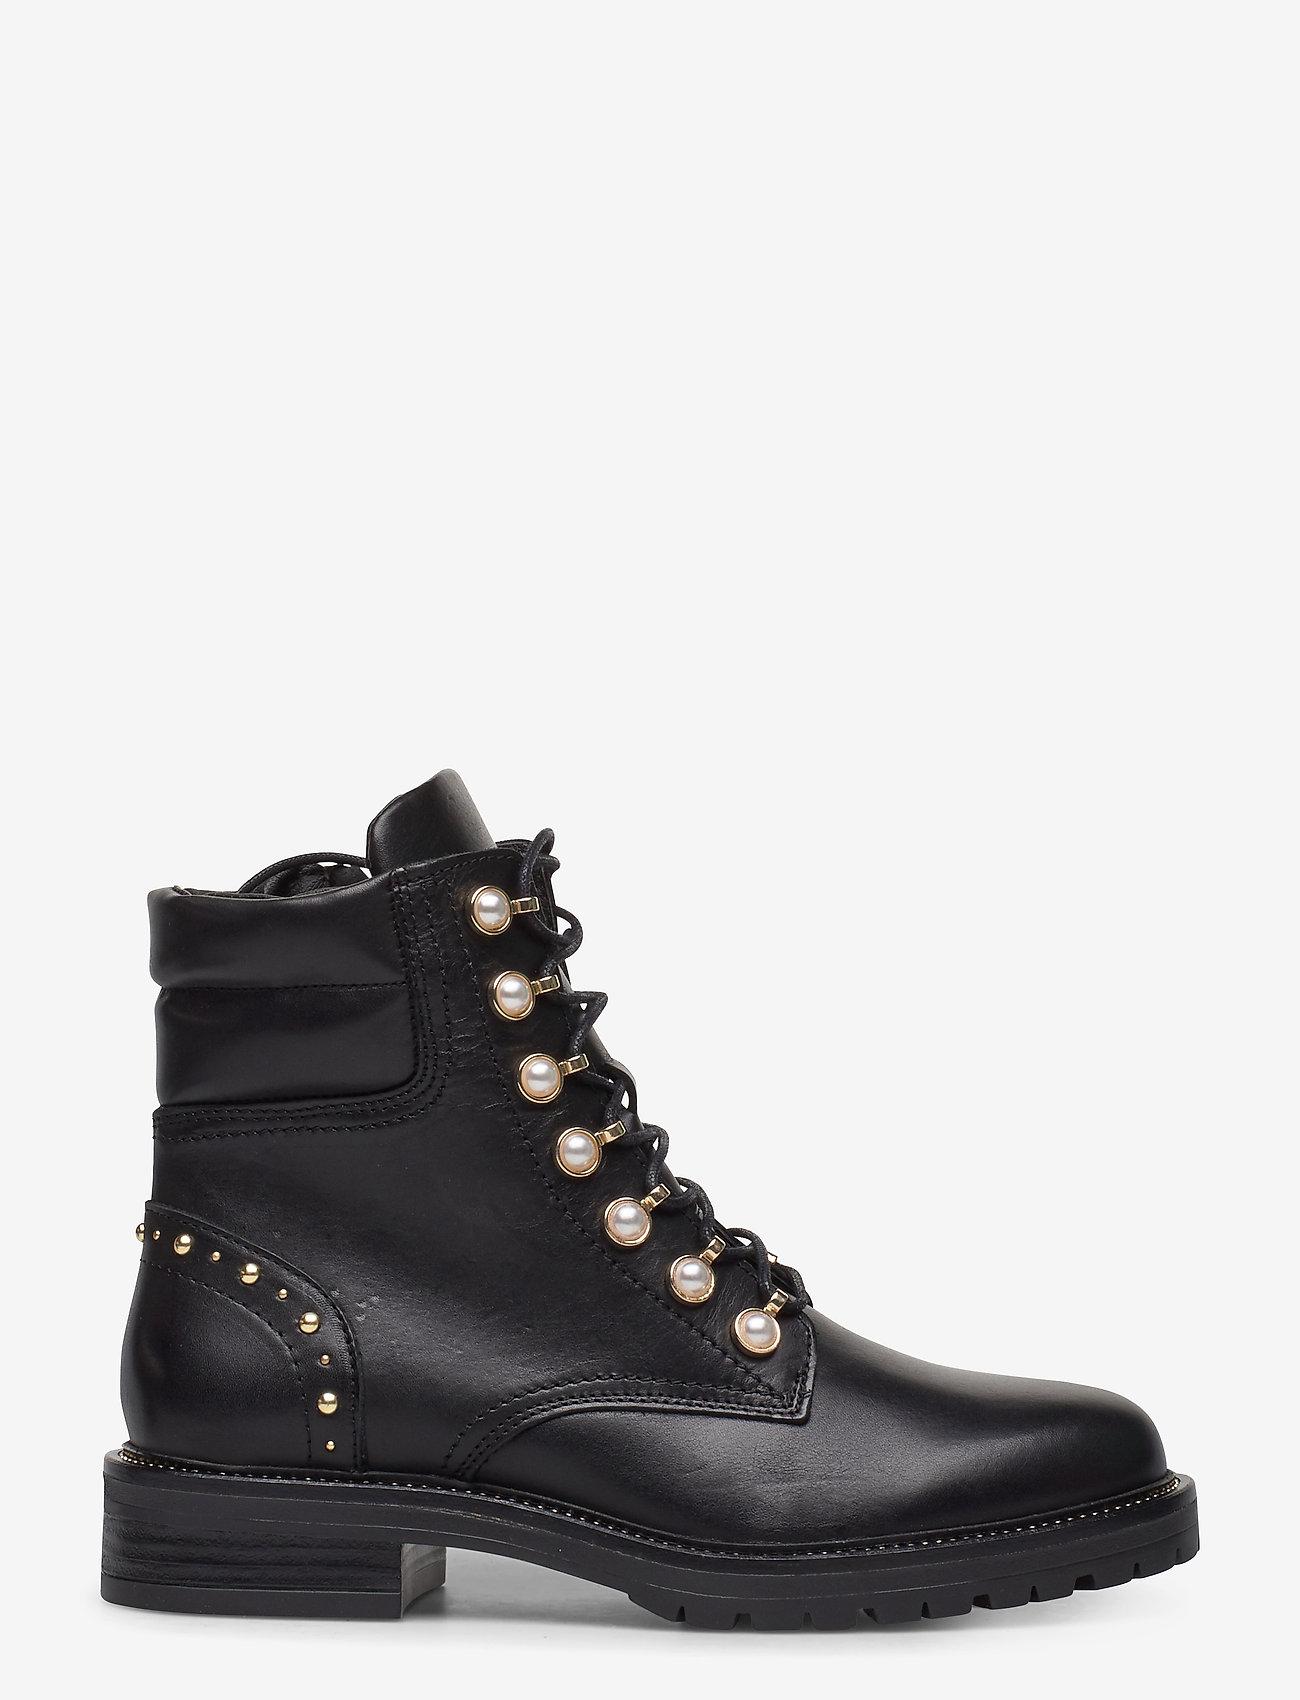 Pearley (Black Leather) - Dune London MAXkW5